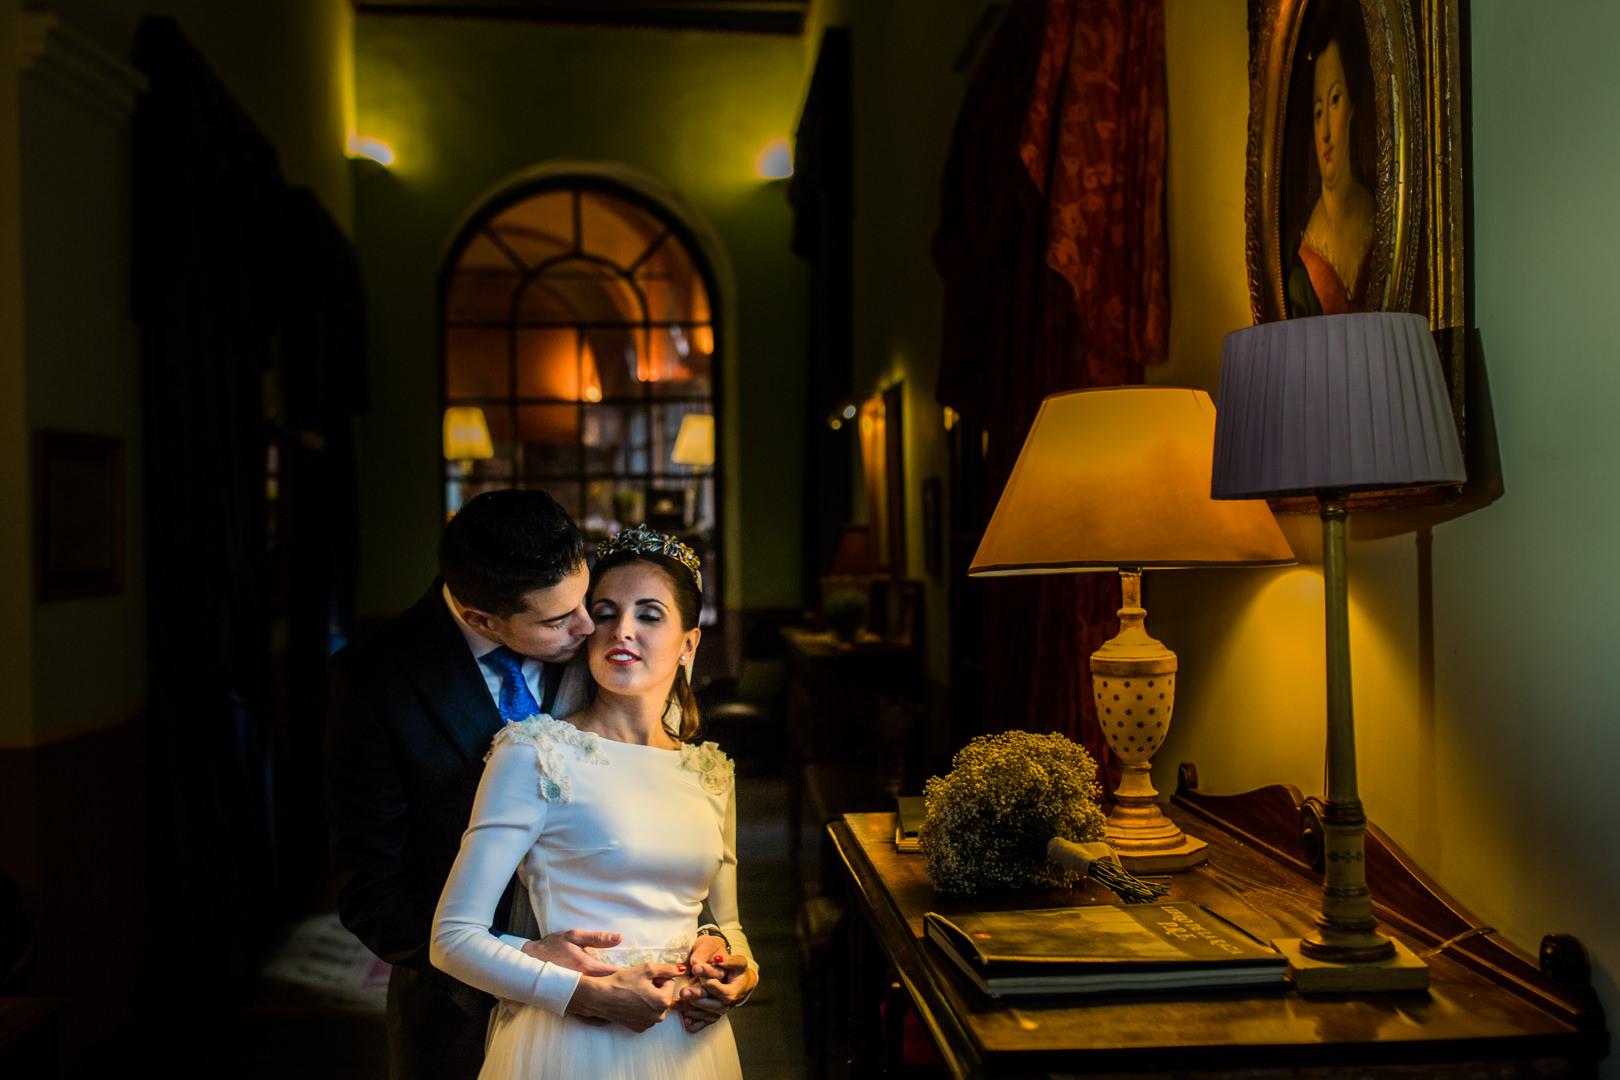 Boda-sevilla-Wedding-engagement-Rafael-Torres-fotografo-bodas-sevilla-madrid-barcelona-wedding-photographer--41.jpg